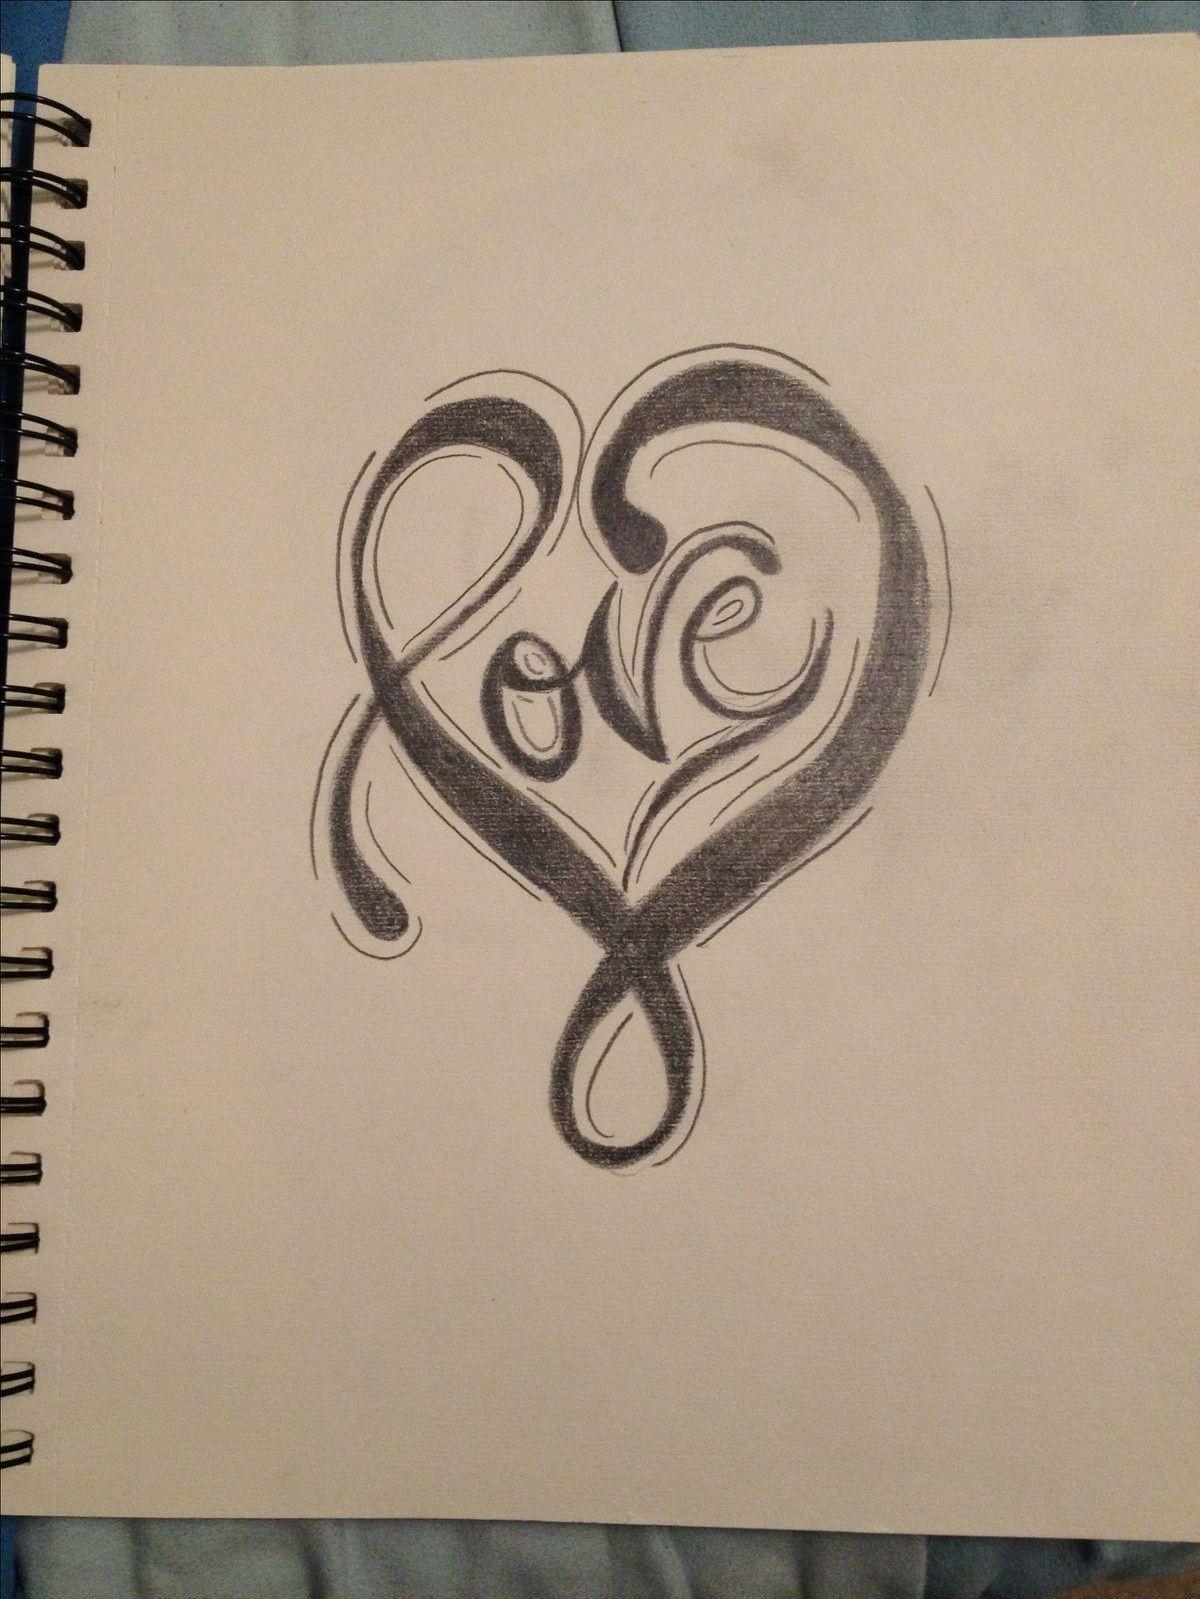 Cute Angel Pencil Drawings Www Topsimages Com